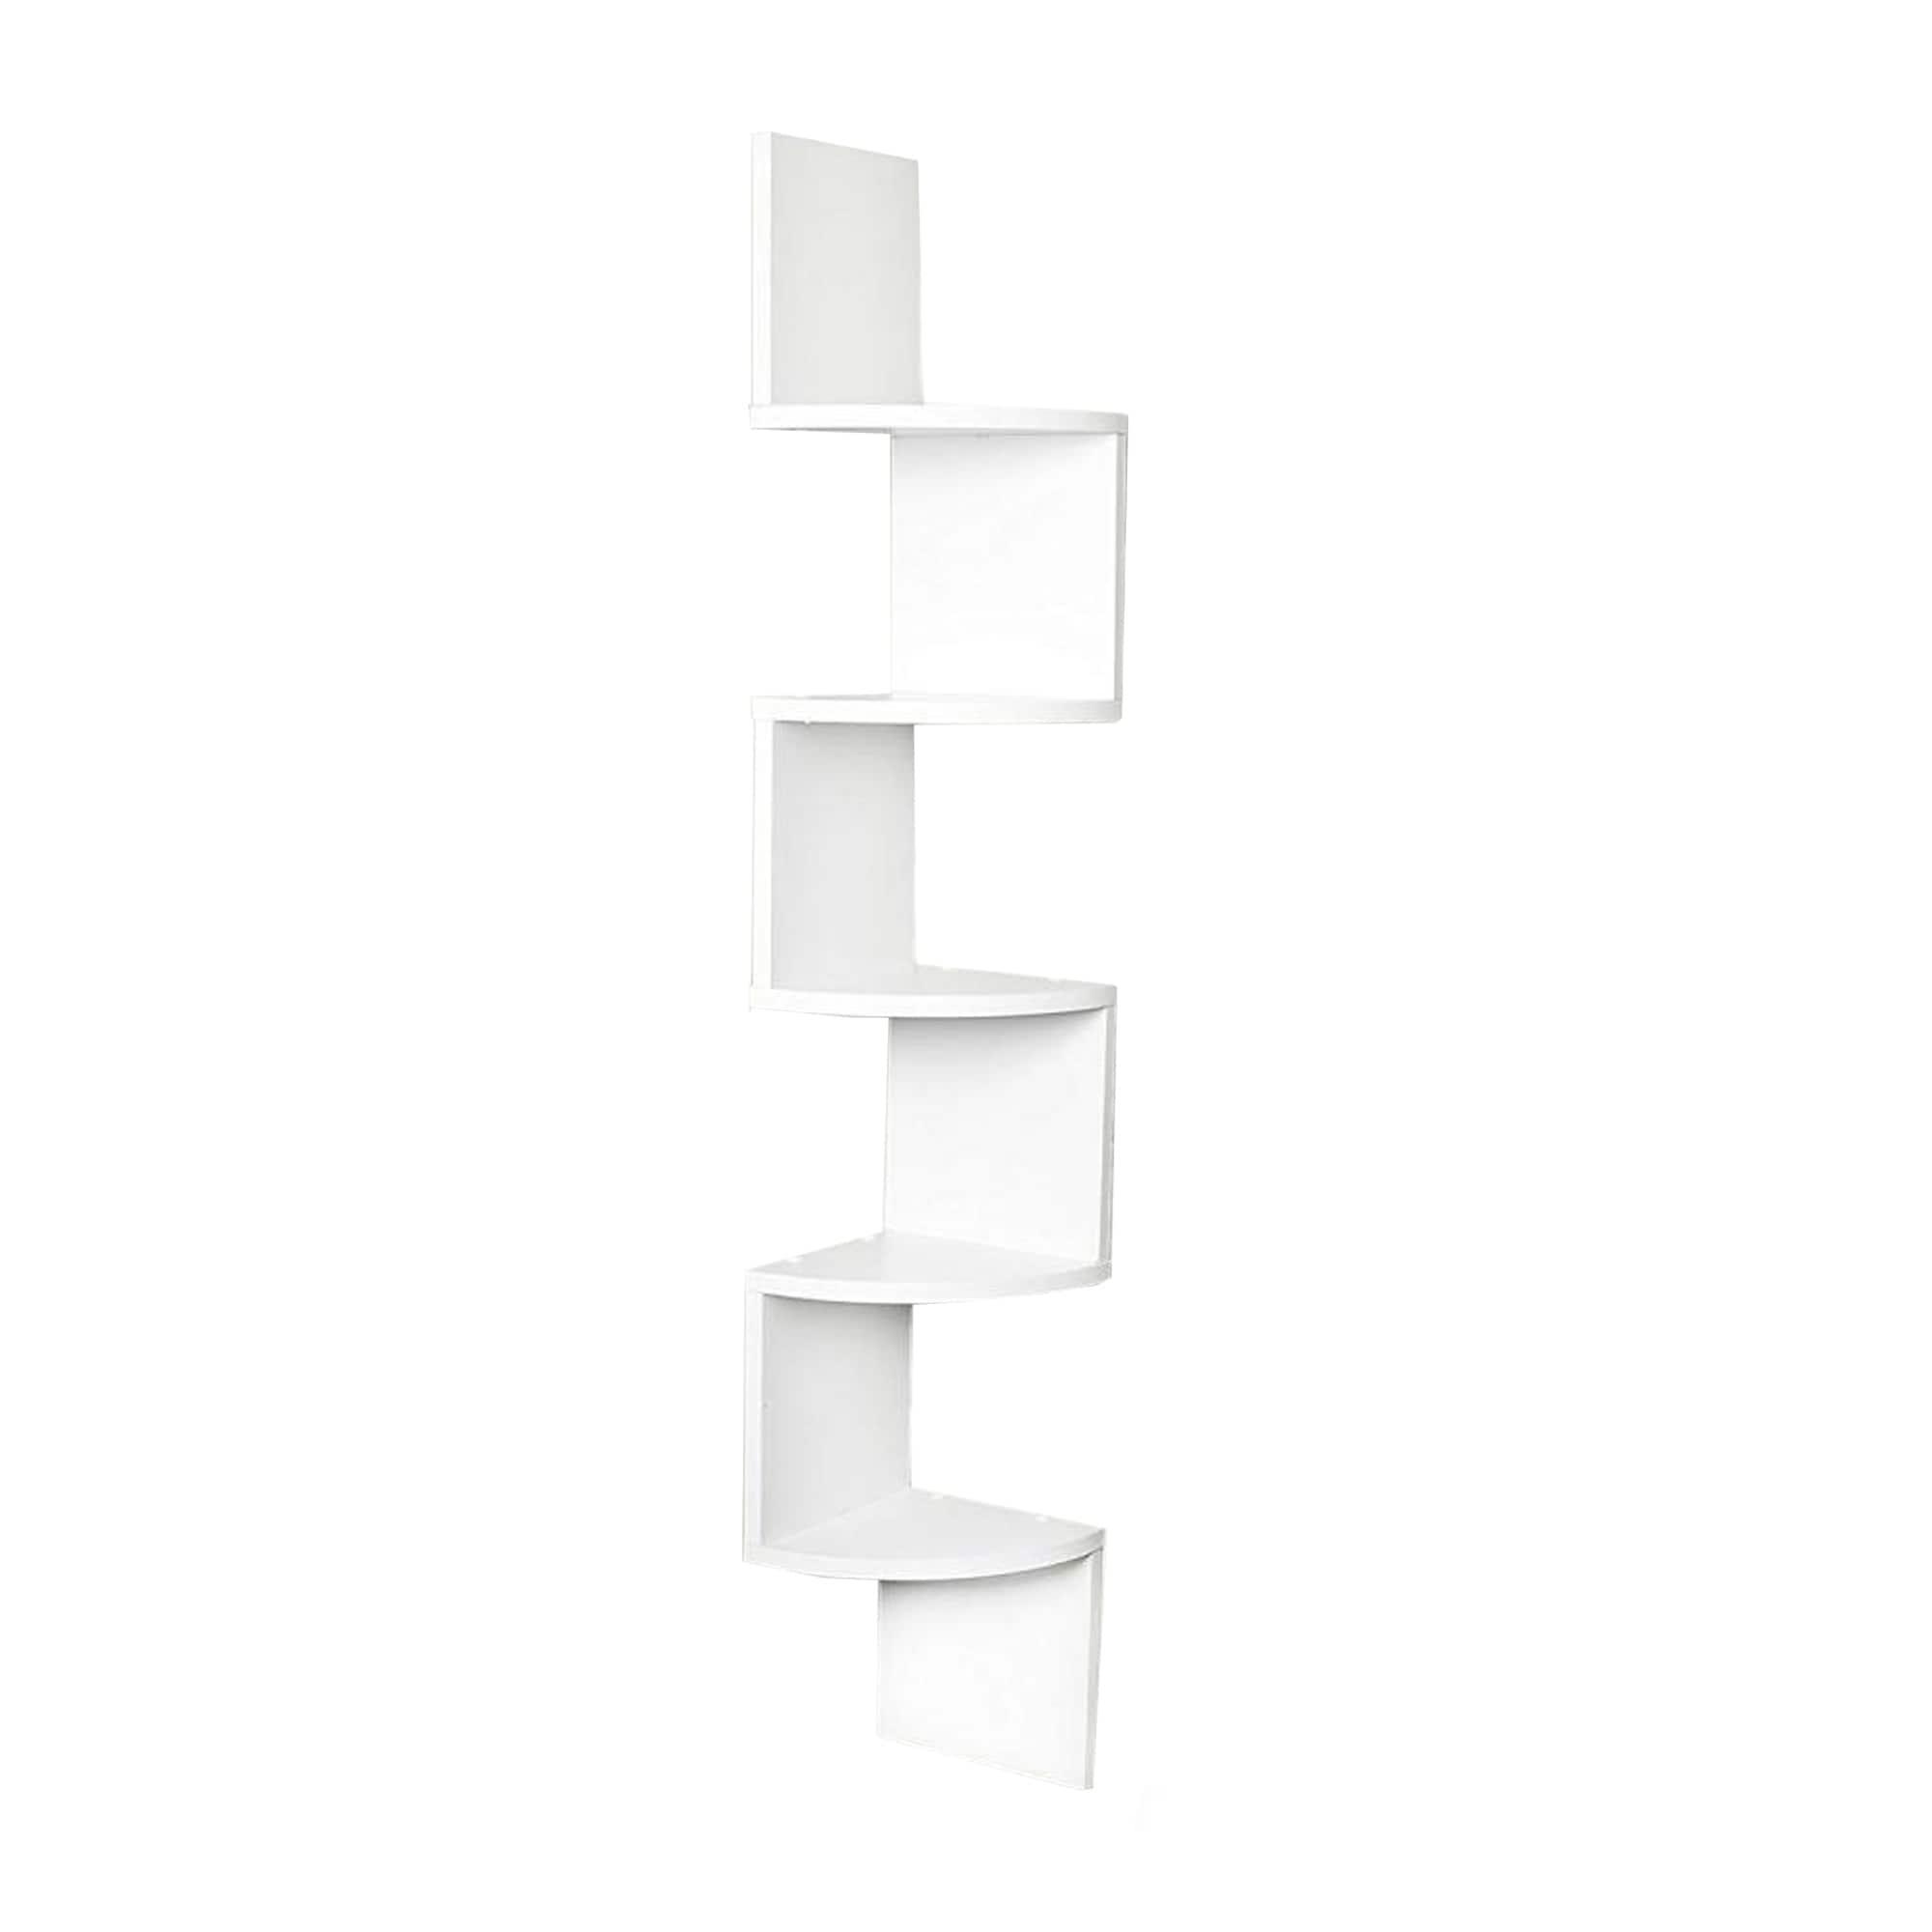 buy decorative shelves accent pieces online at overstock com our rh overstock com decorative wall shelves for kitchen decorative shelving for walls